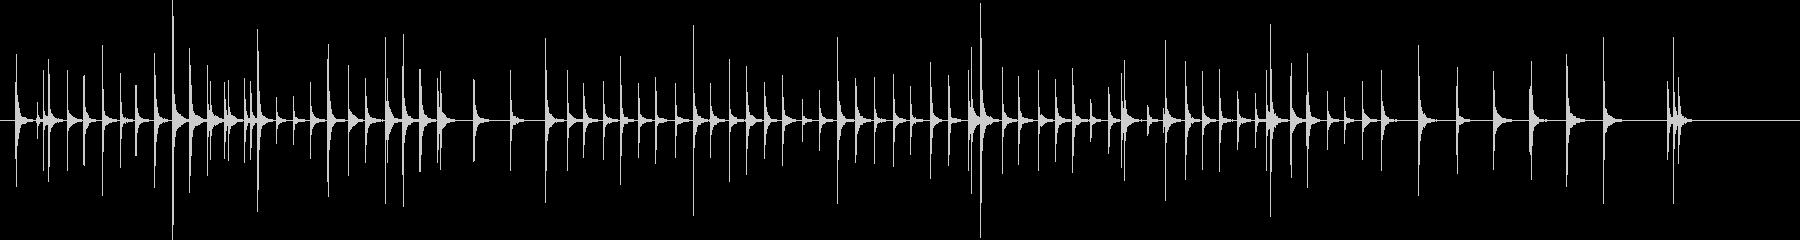 木琴5歌舞伎黒御簾下座音楽和風日本マリンの未再生の波形